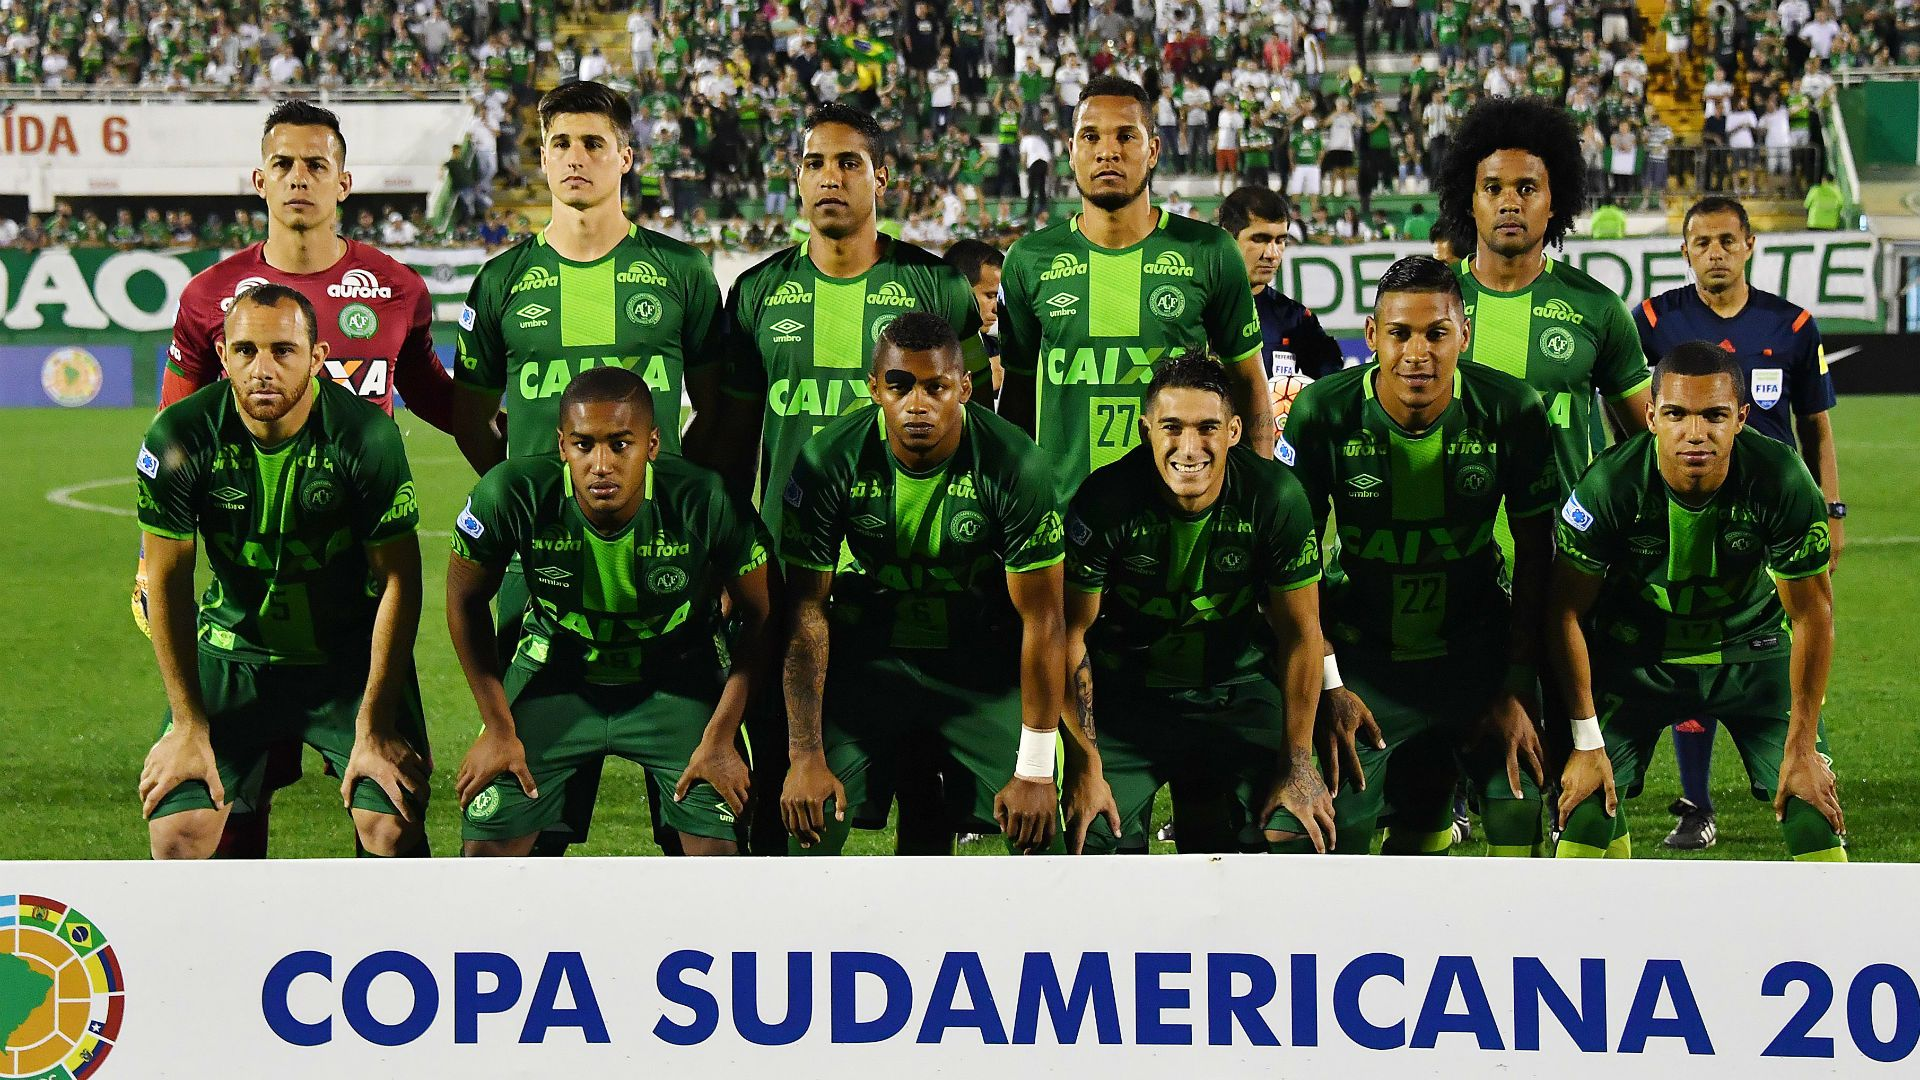 Chapecoense Suffer The Cruellest End To Heroic Copa Sudamericana